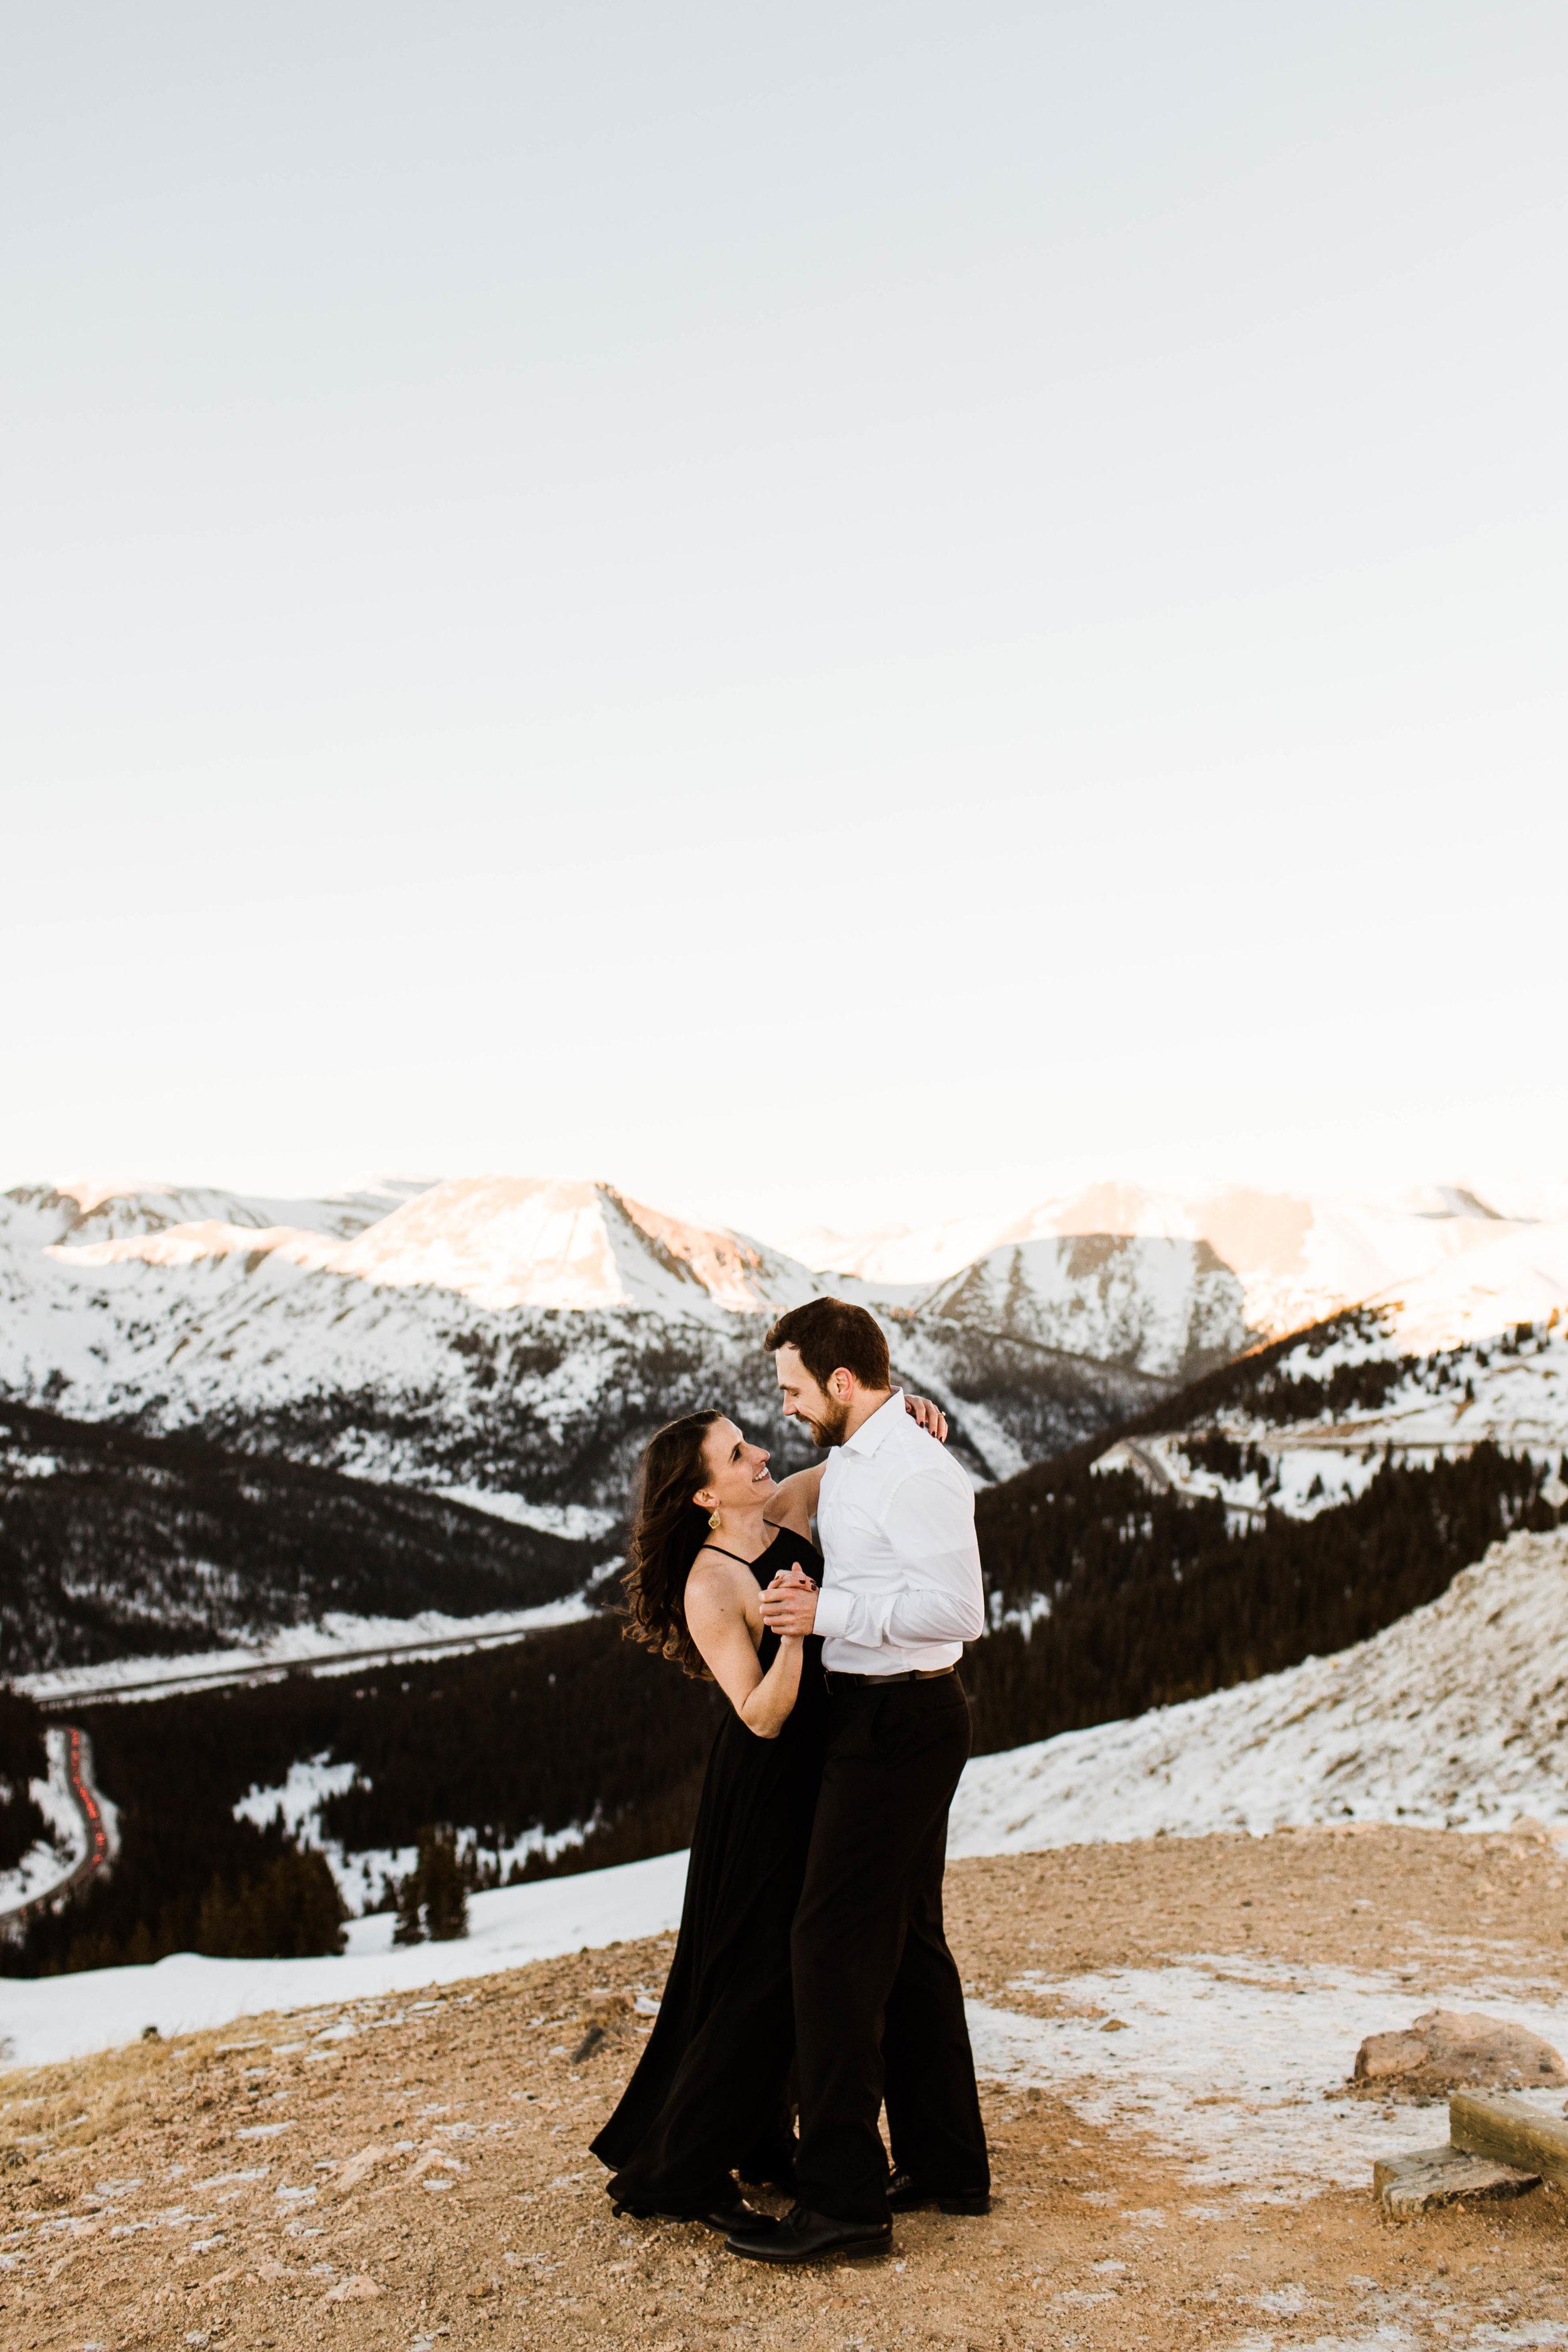 Snowy Loveland Pass elopement near Breckenridge Colorado